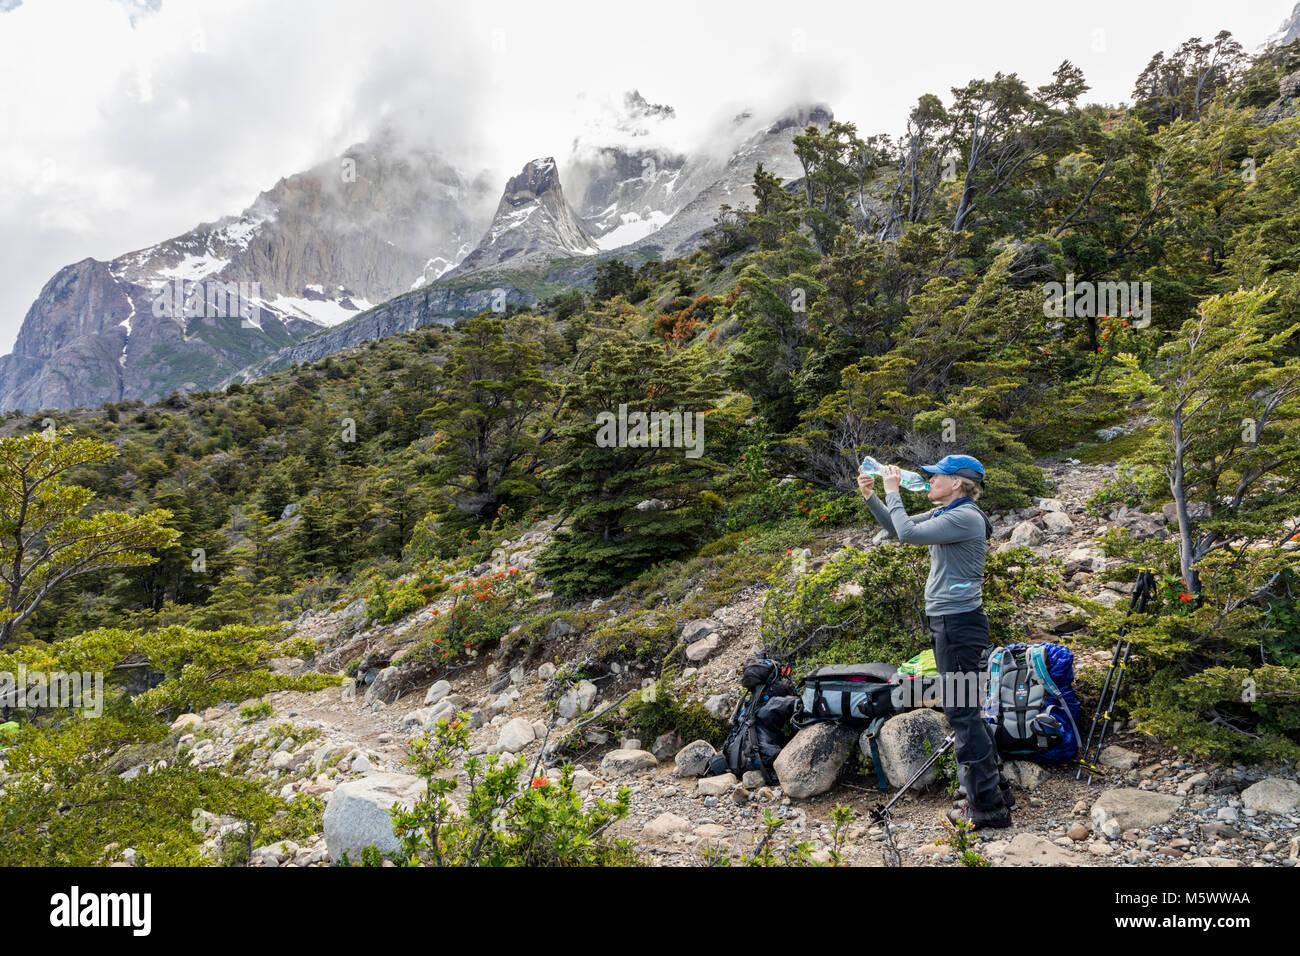 Trekker femmina pause per bere acqua; Cordillera Paine al di là; Parco Nazionale Torres del Paine; Cile Immagini Stock